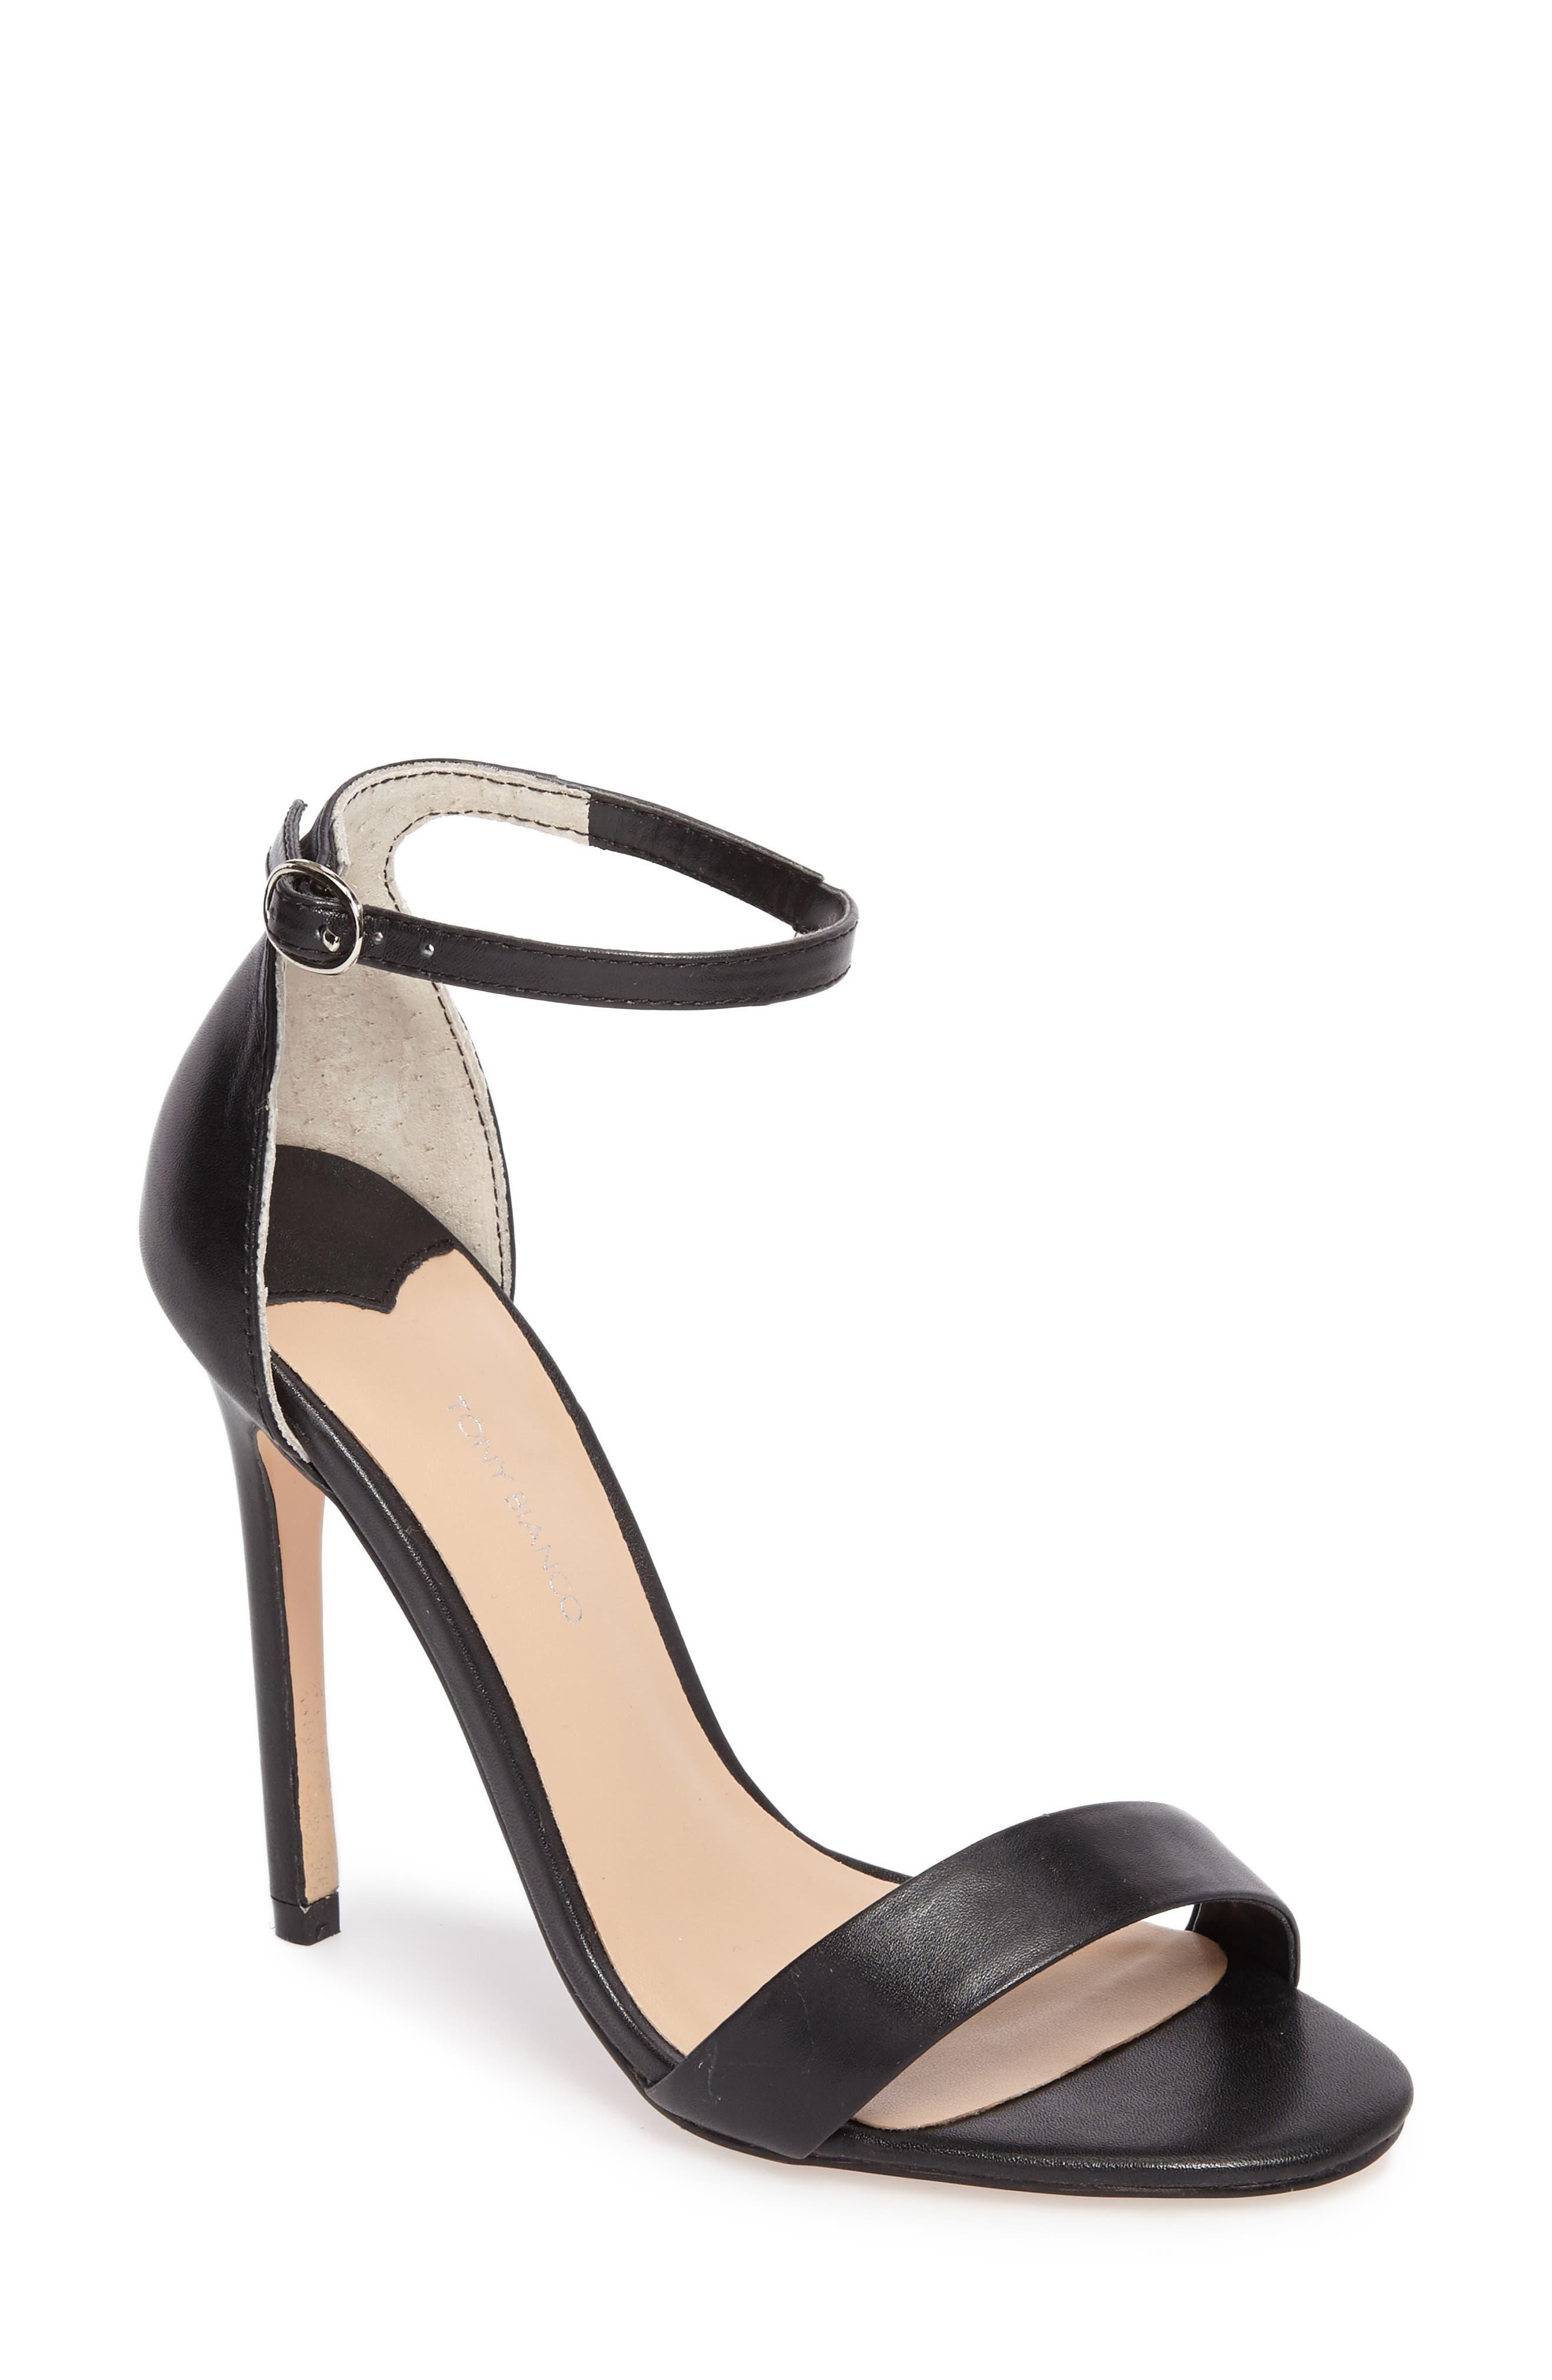 Karvan Ankle Strap Sandal,                             Main thumbnail 1, color,                             002